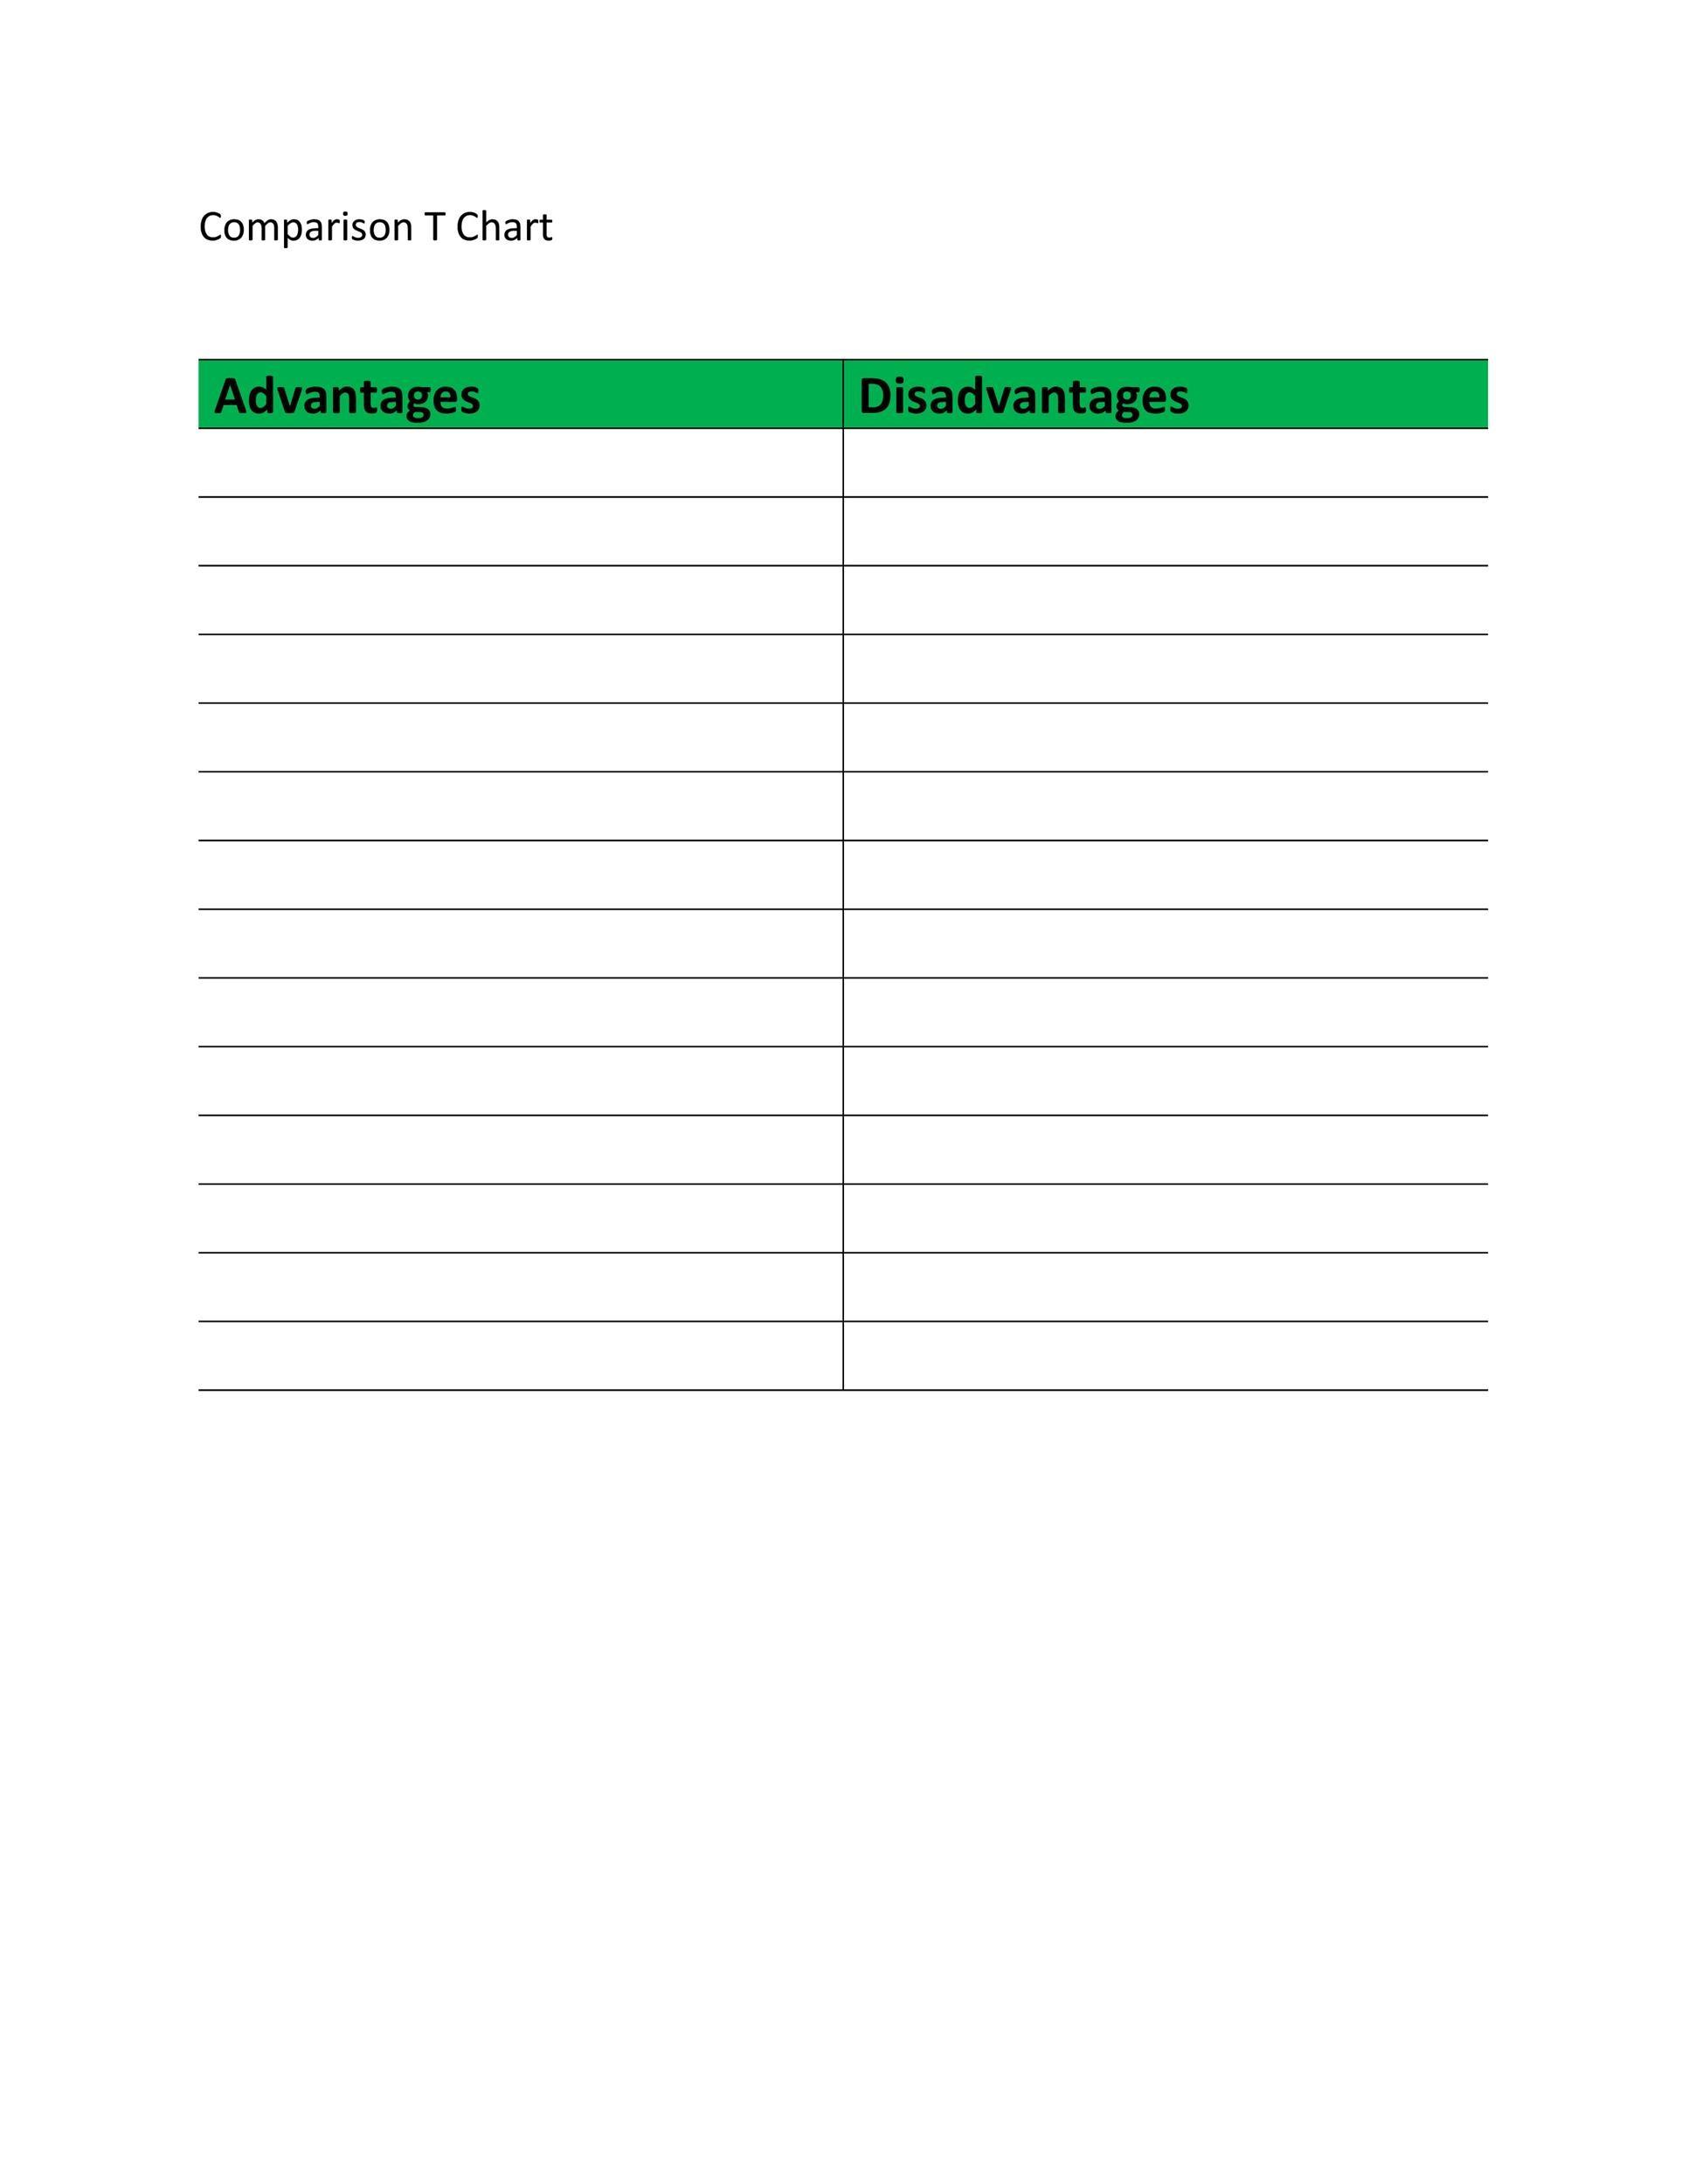 Free Comparison Chart Template 29